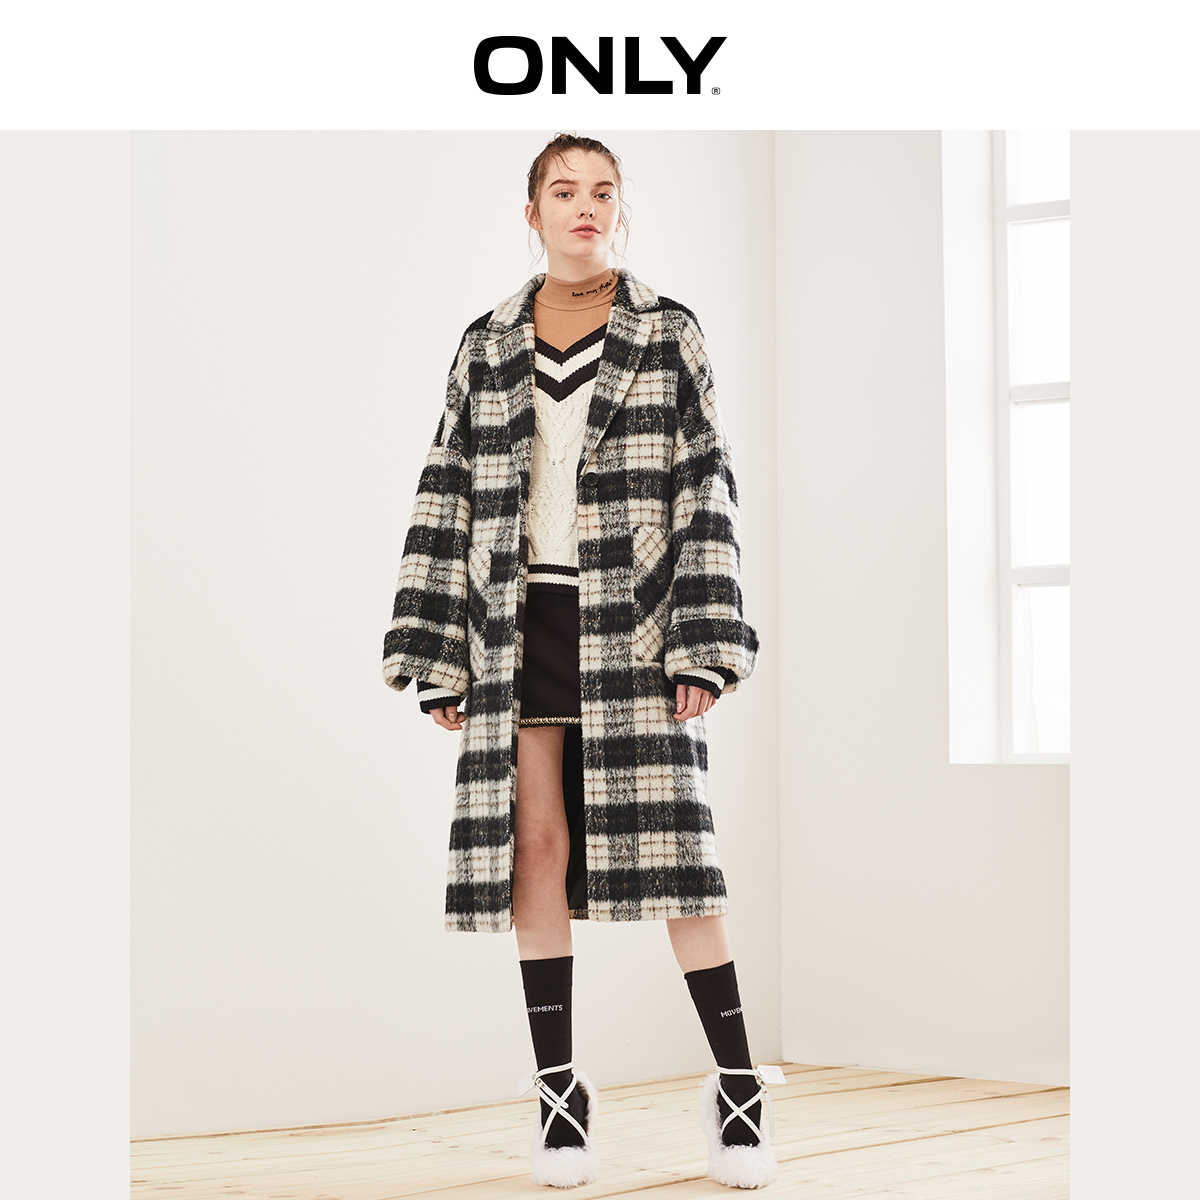 ONLY  Autumn Winter Women's Checked Roll-up Woolen Coat | 11936U506